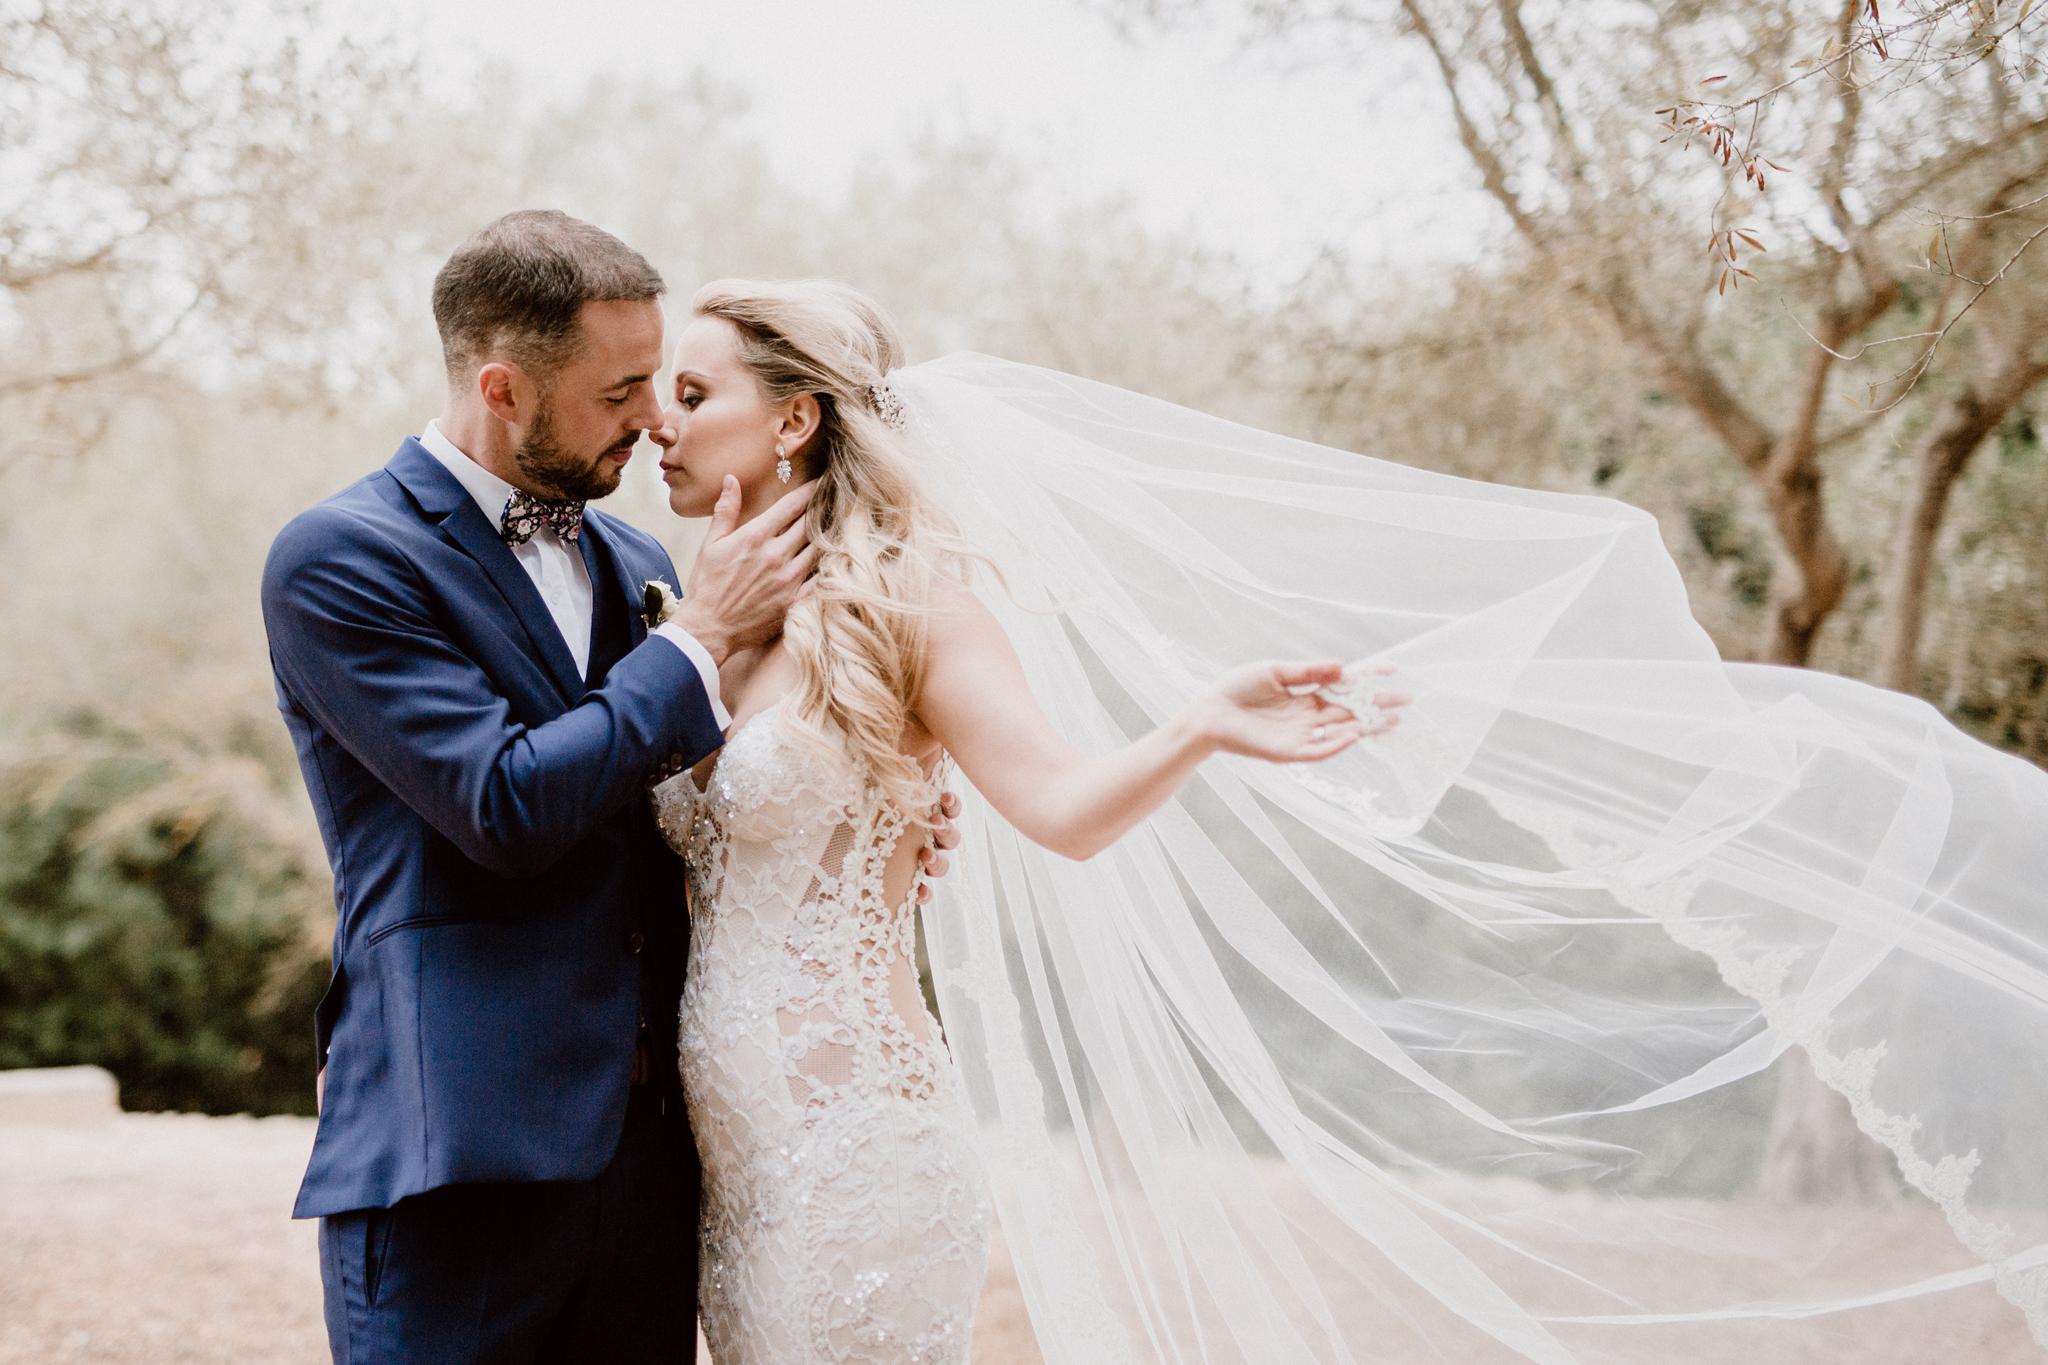 Fotograf Hochzeit palma de mallorca